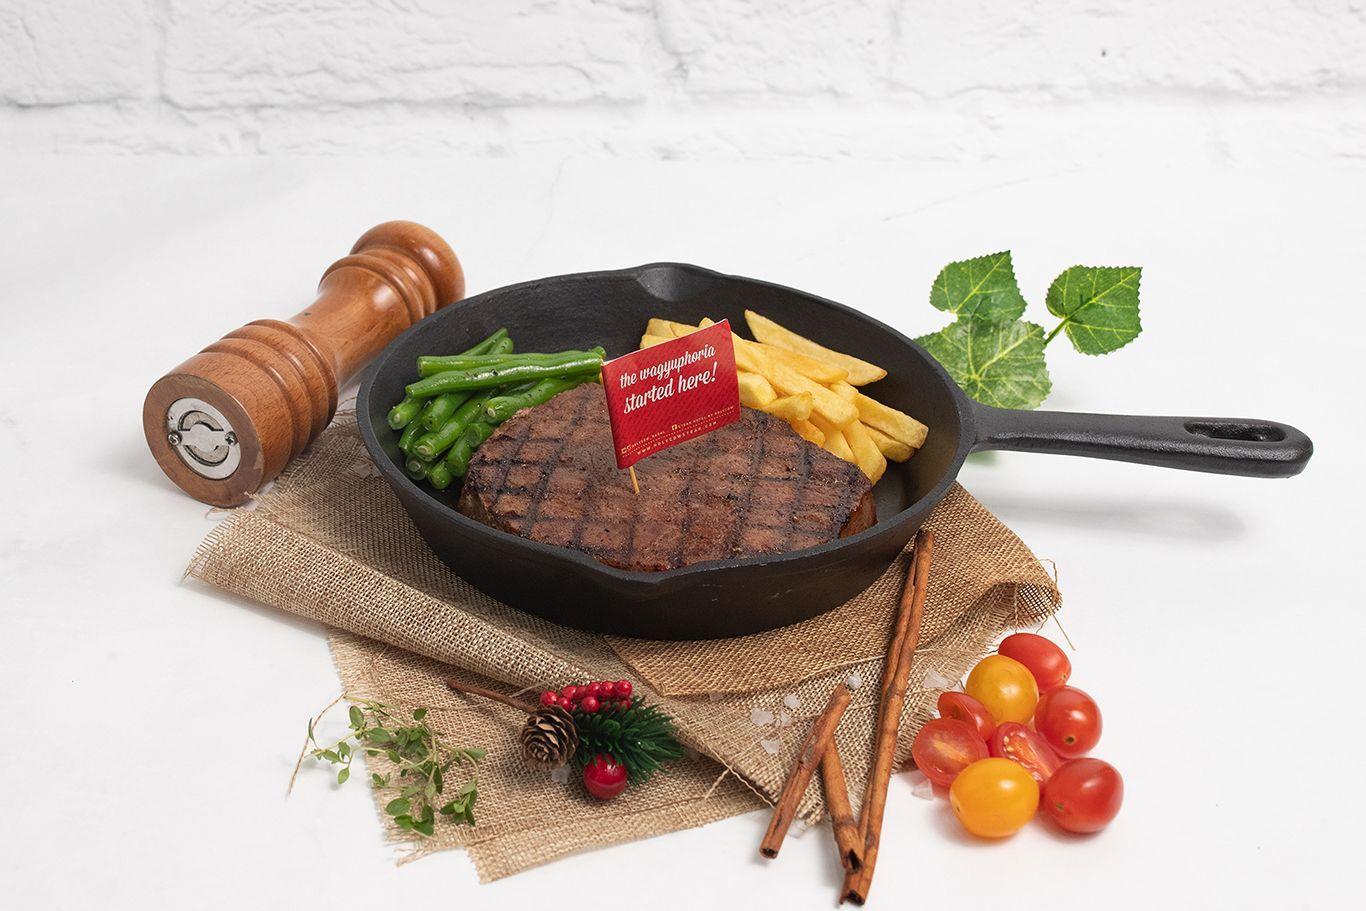 Lapar? Yuk Makan Mewah Wagyu Steak Dibawah Rp250 Ribu di TKP Ini